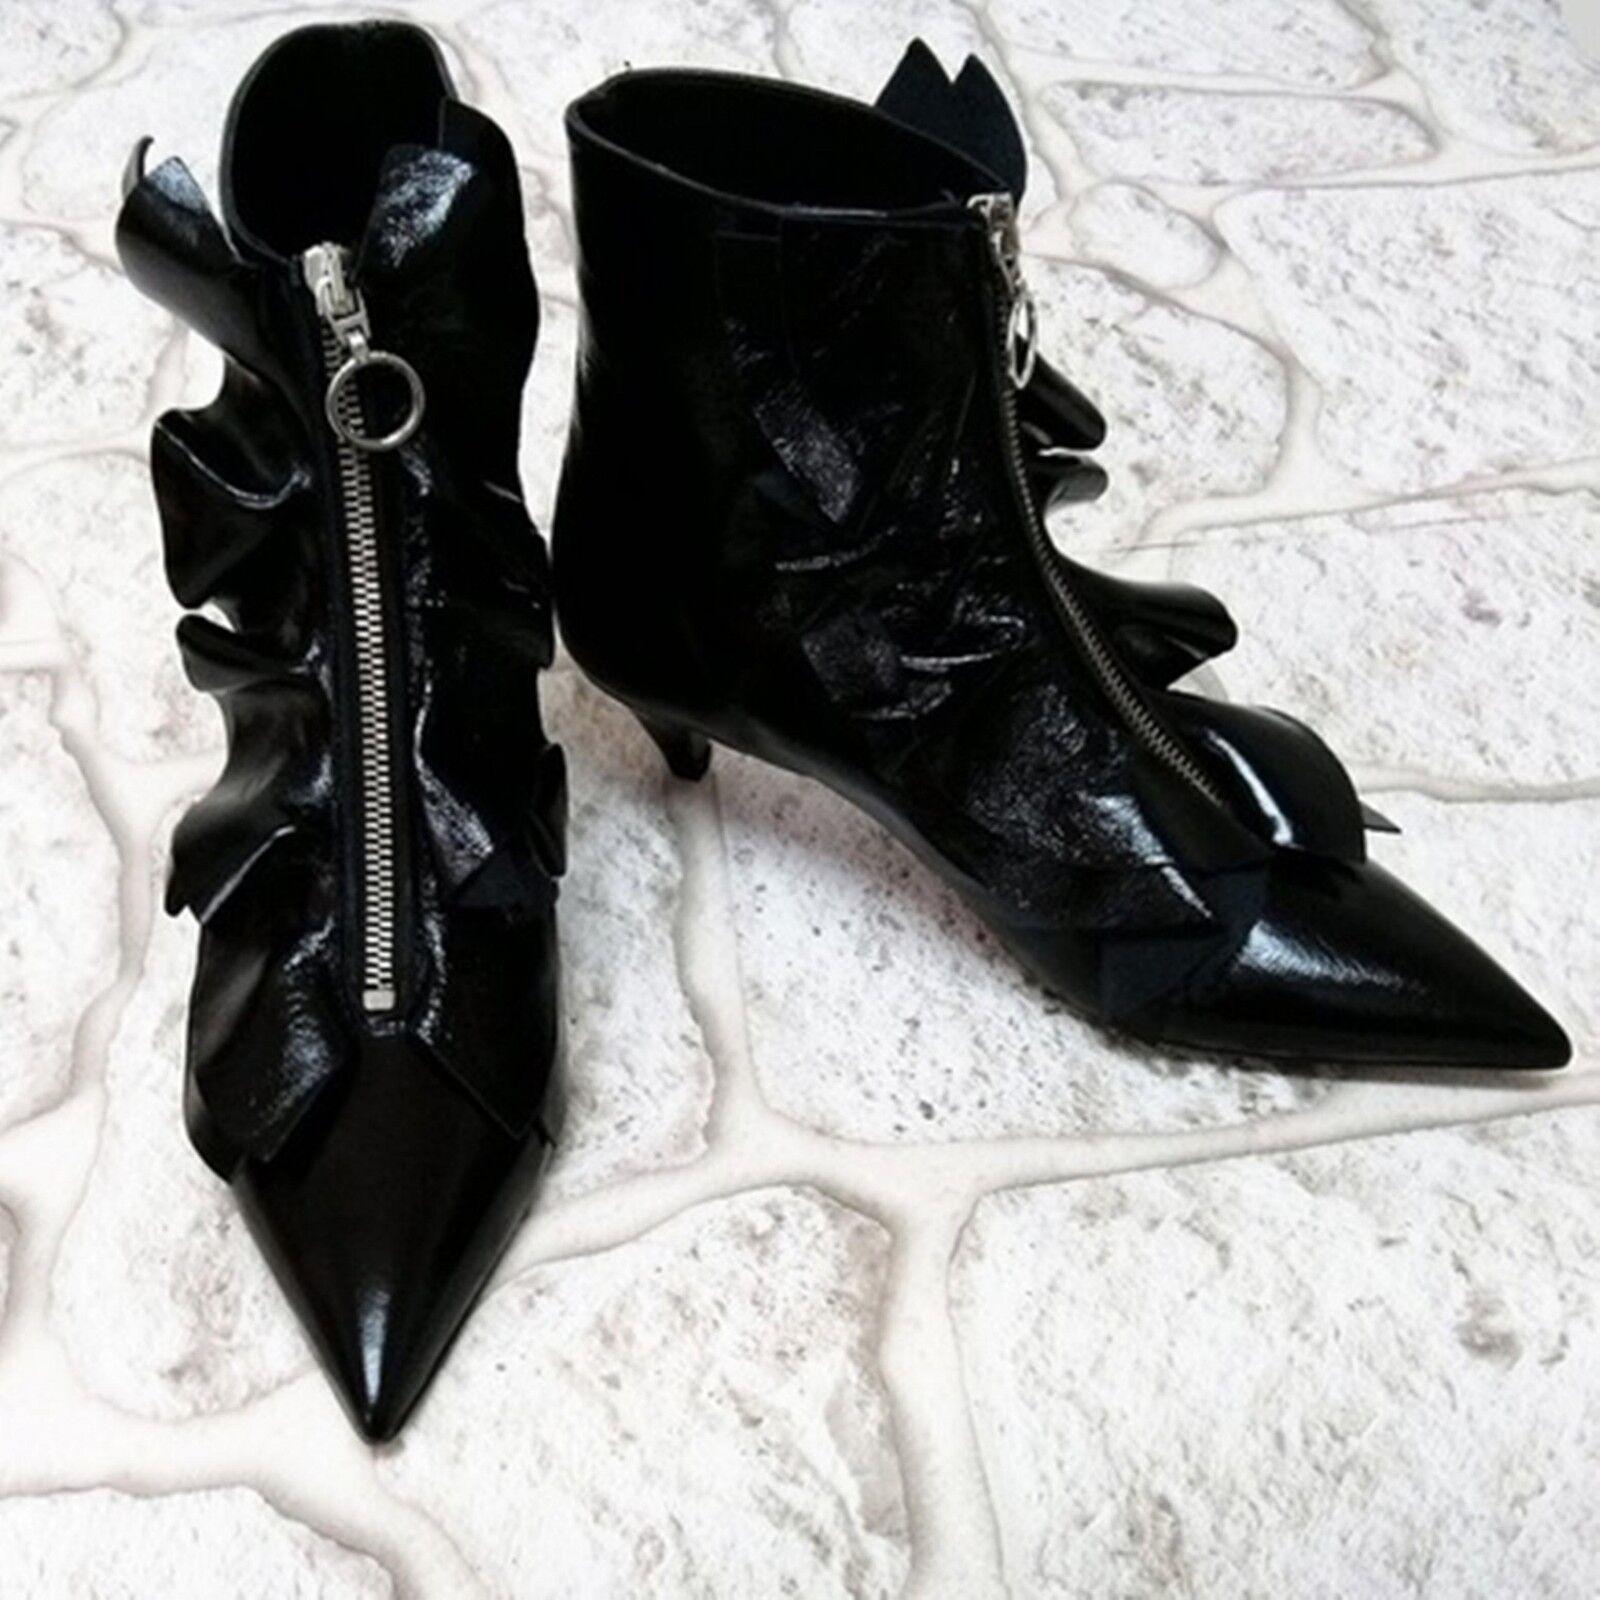 ZARA BLACK 5 LEATHER ANKLE Stiefel SIZE 5 BLACK 6 UK 38 39 EU 7.5 8 US e39ac0